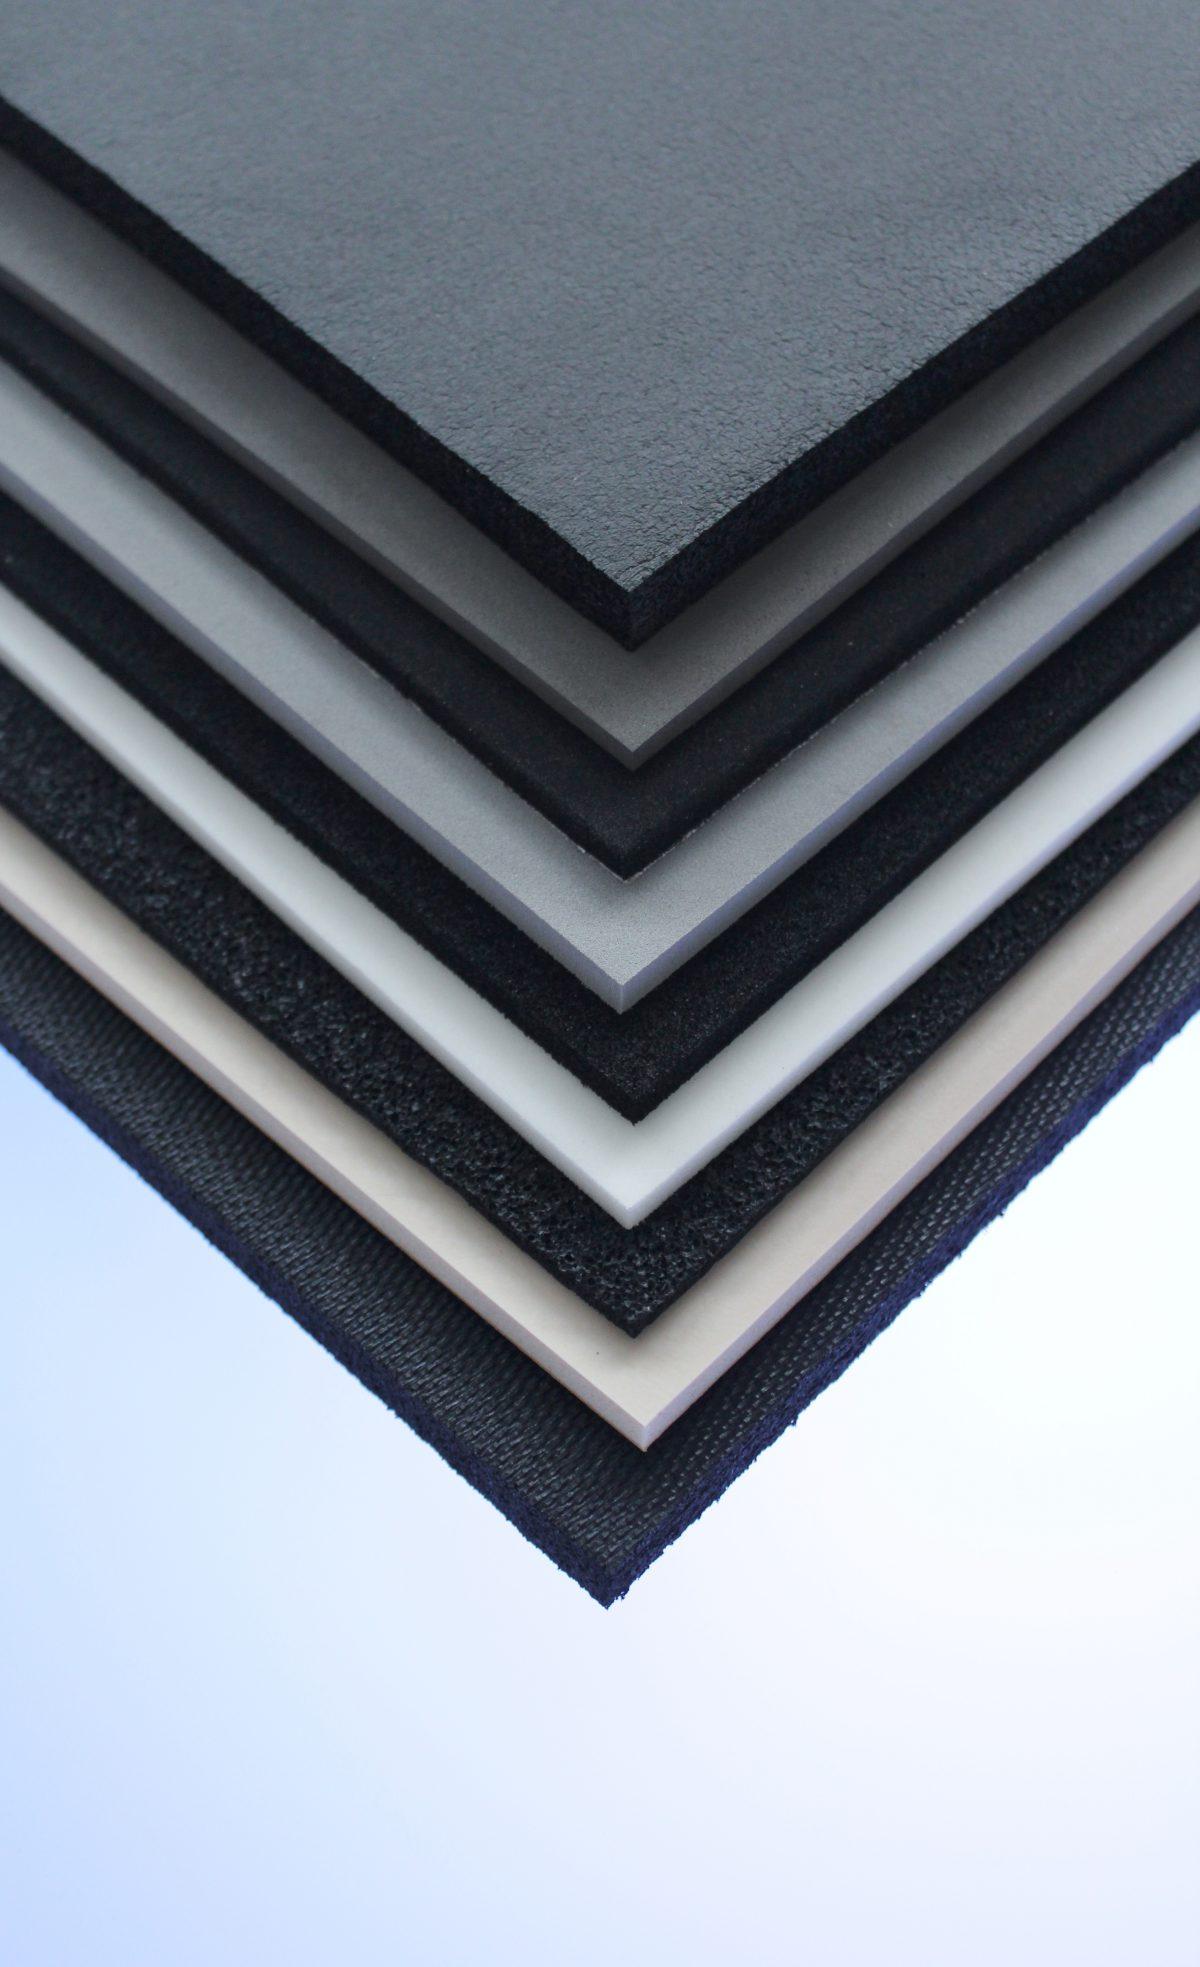 Sponge Foam and Cellular Grades EMI RFI seals gaskets